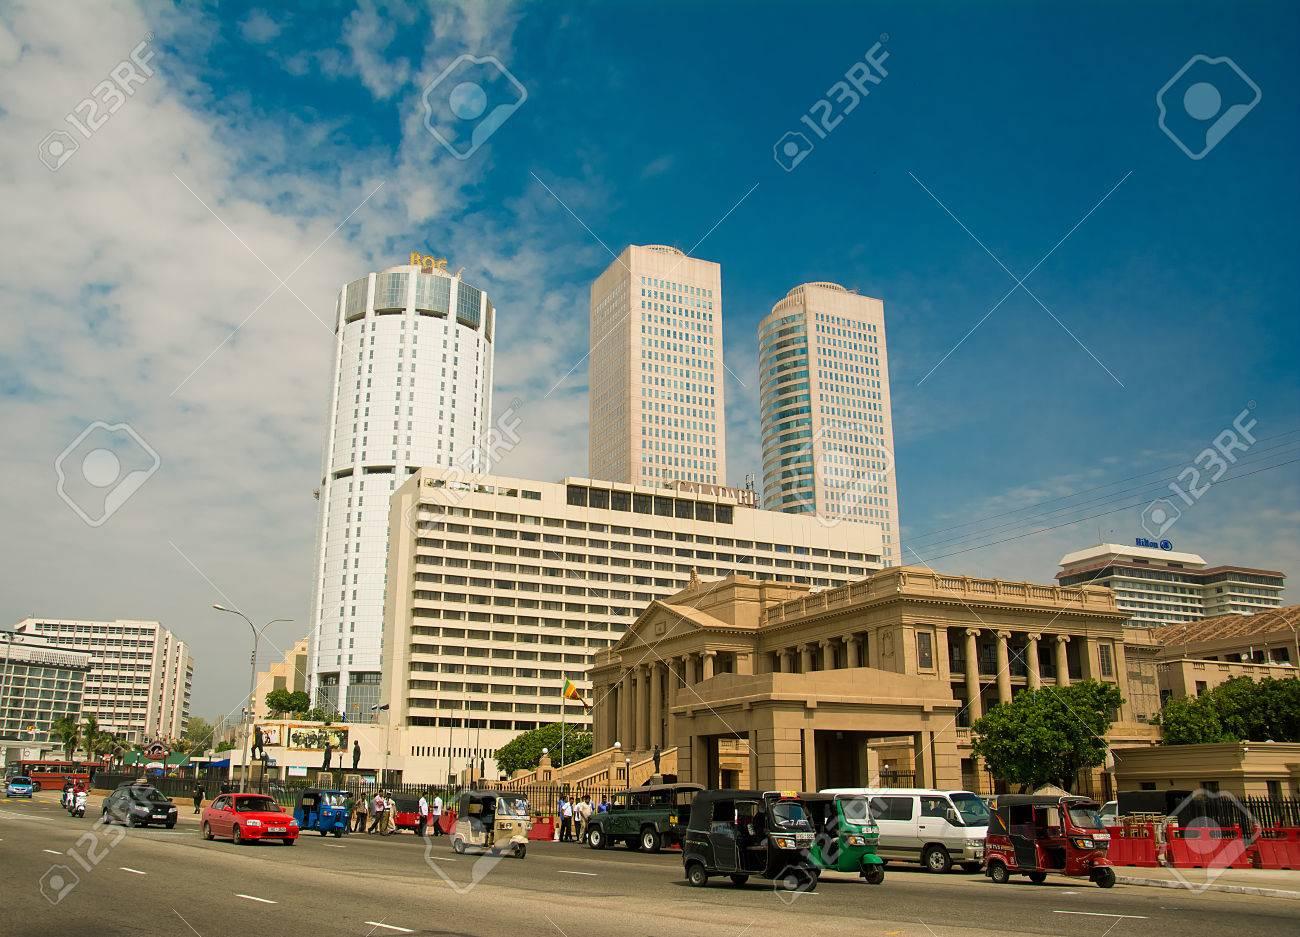 Colombo Sri Lanka 15 Juni 2014 Colombo Ist Die Größte Stadt